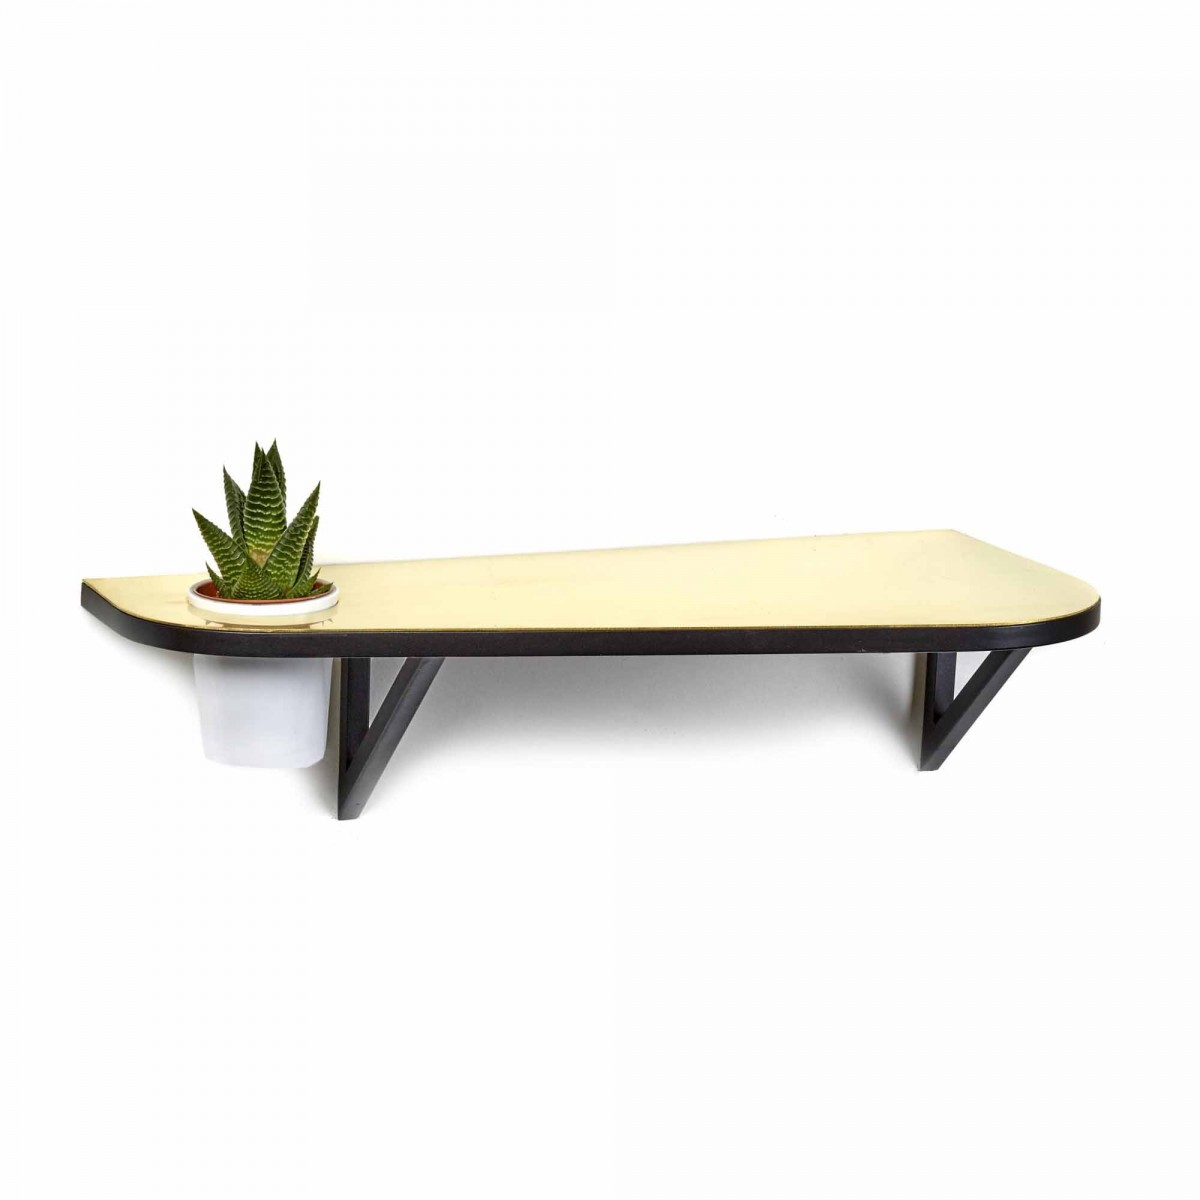 etag re vintage cuivre jaune serax. Black Bedroom Furniture Sets. Home Design Ideas